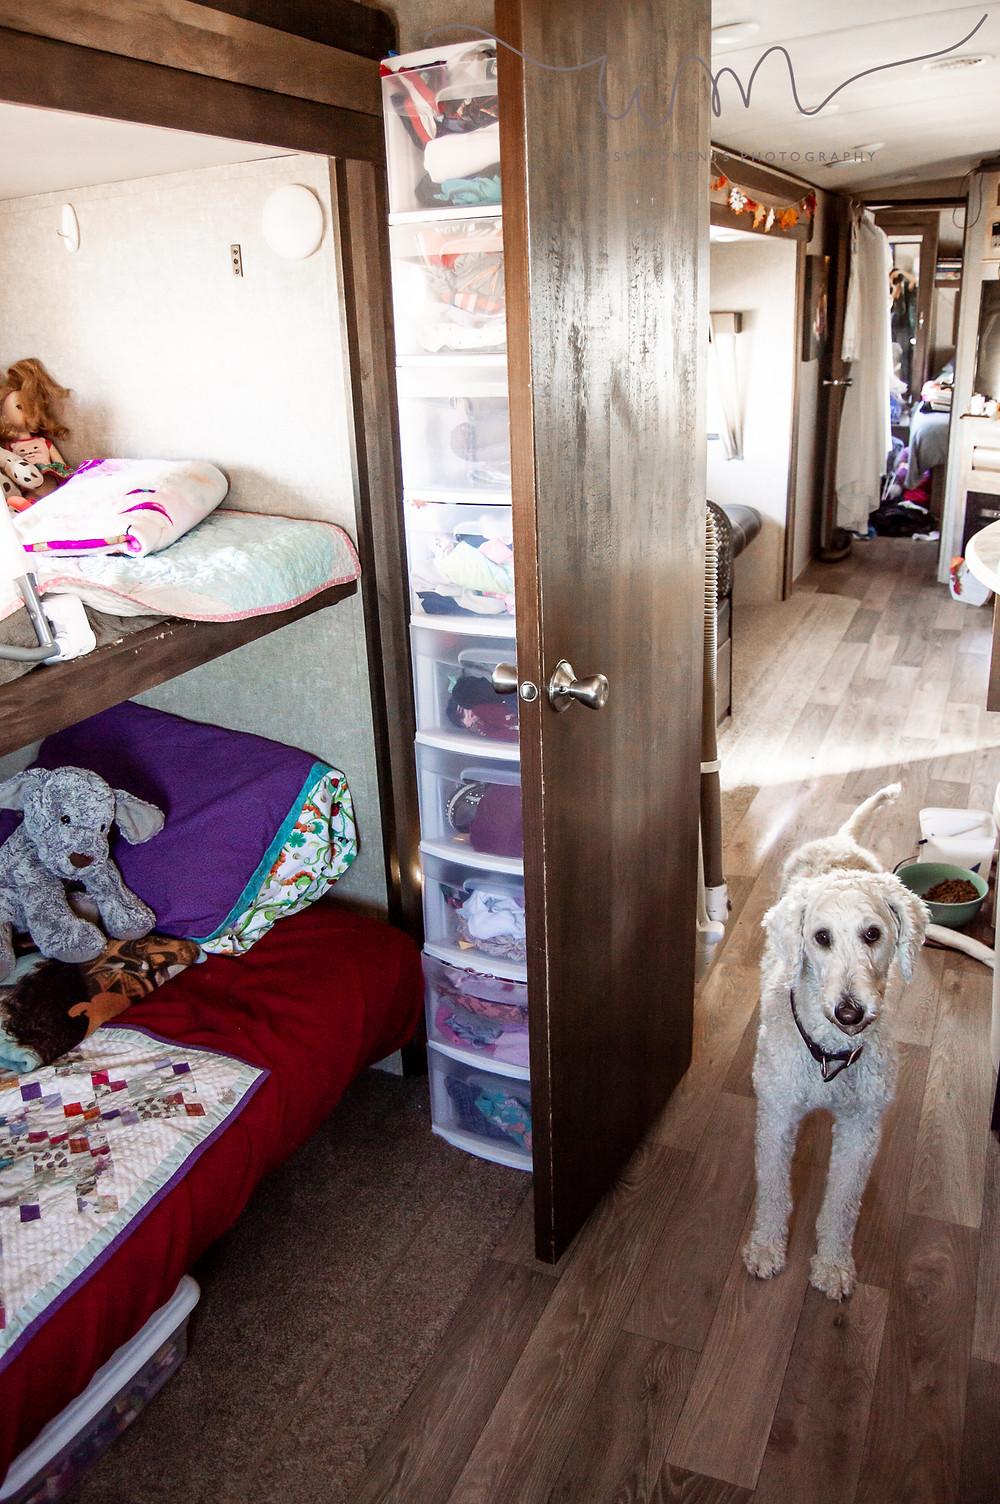 Girls beds in camper